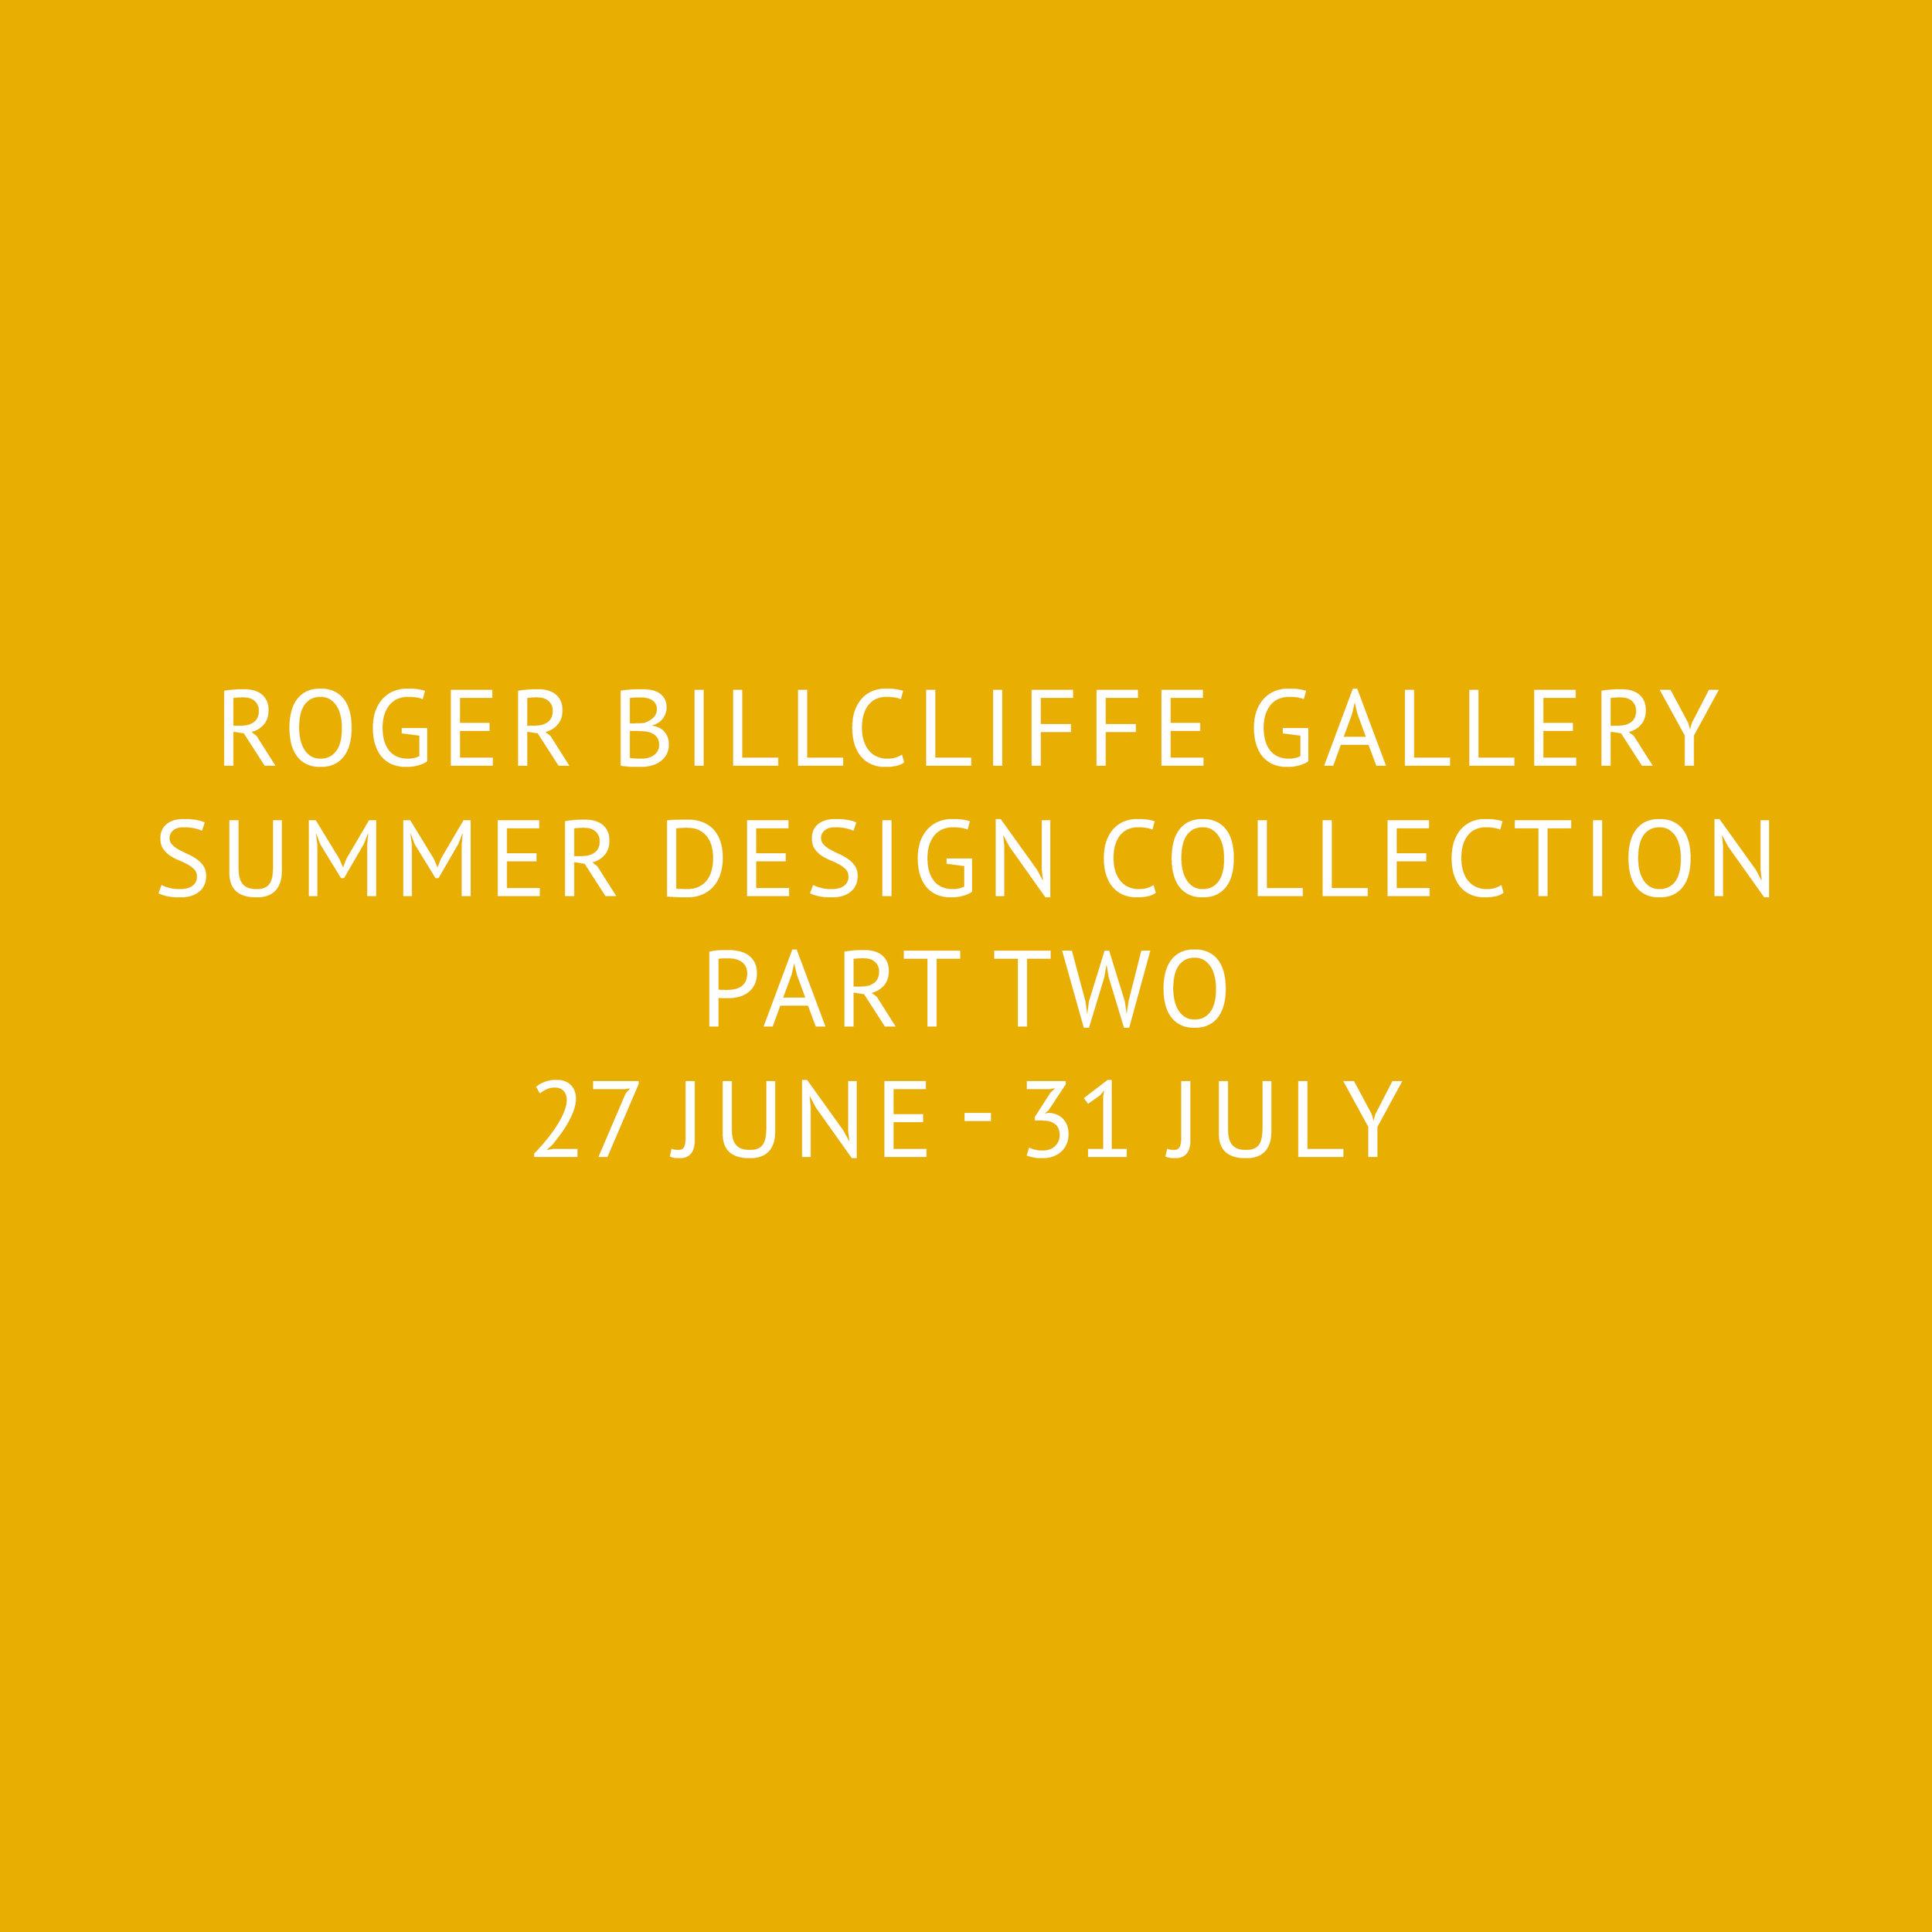 roger bilcliffe gallery.jpg